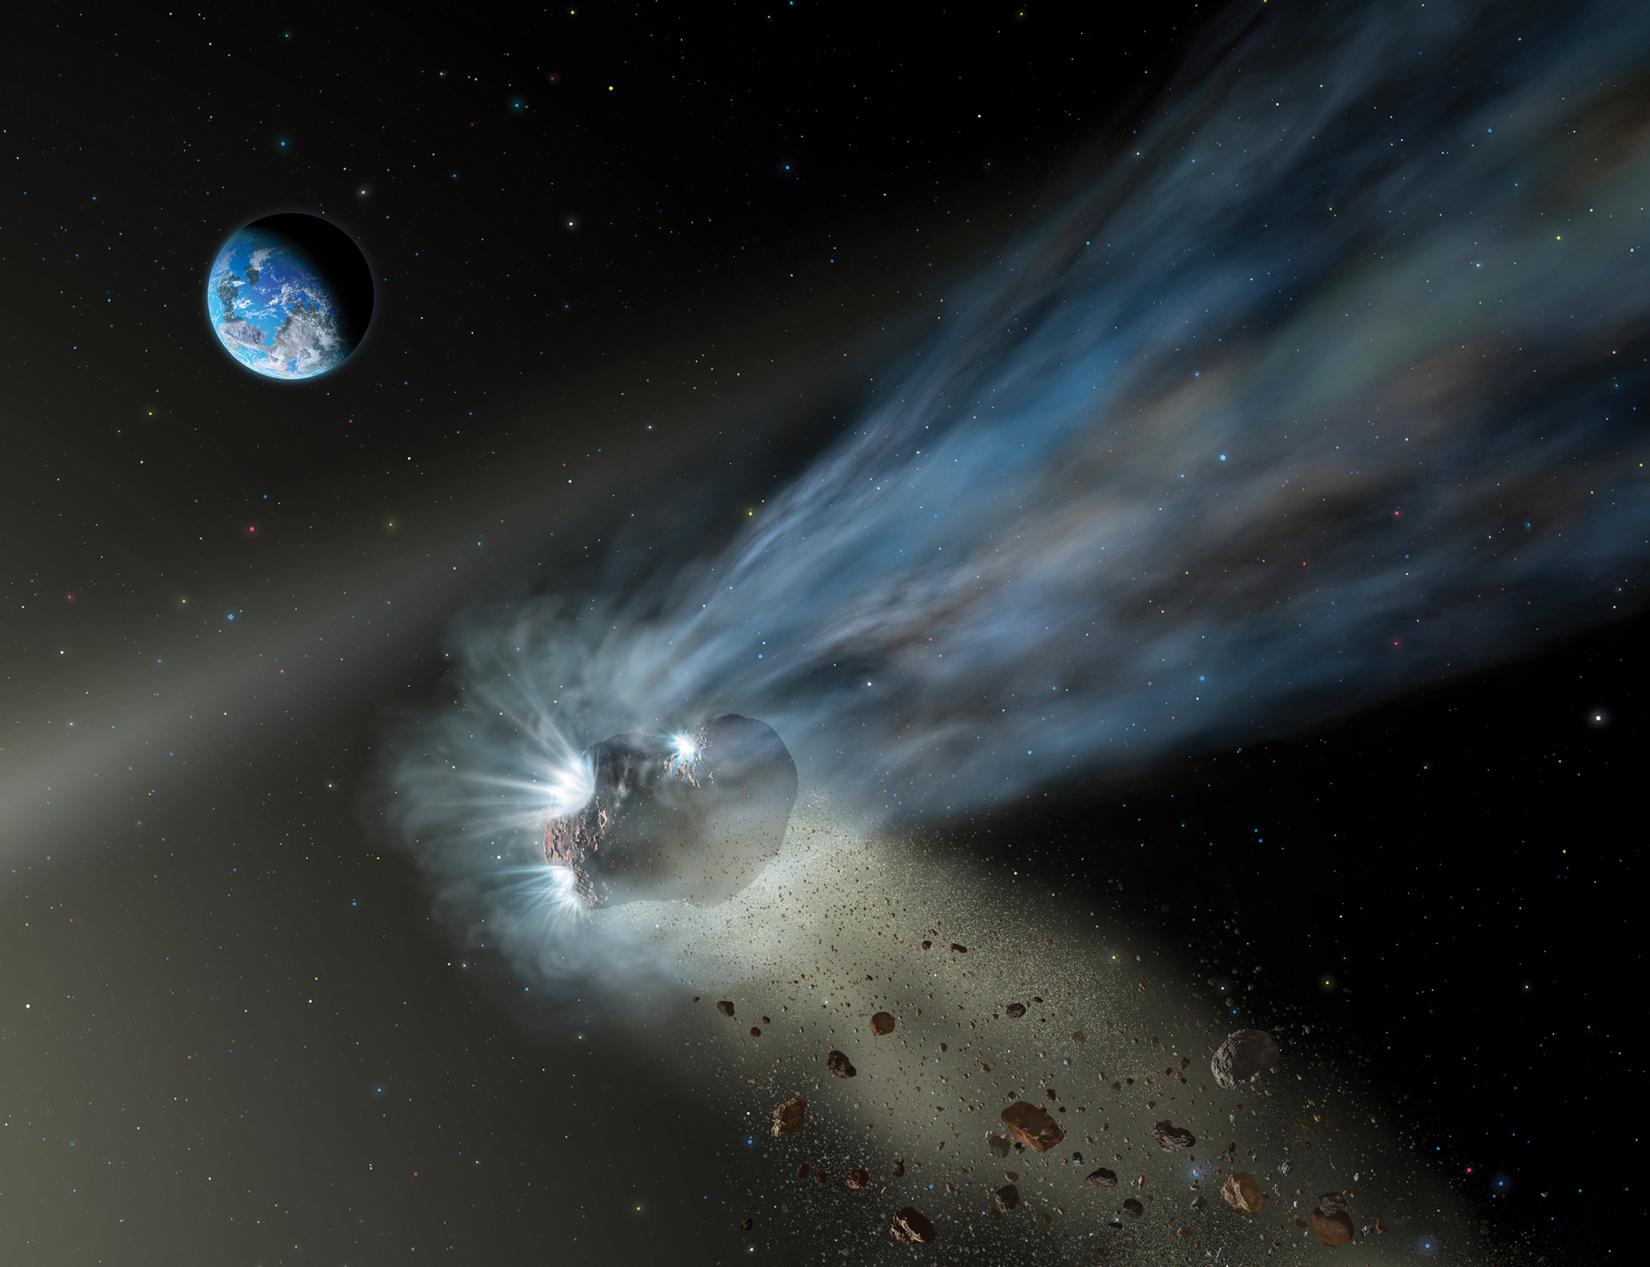 Artist's impression of Comet Pan-STARRS